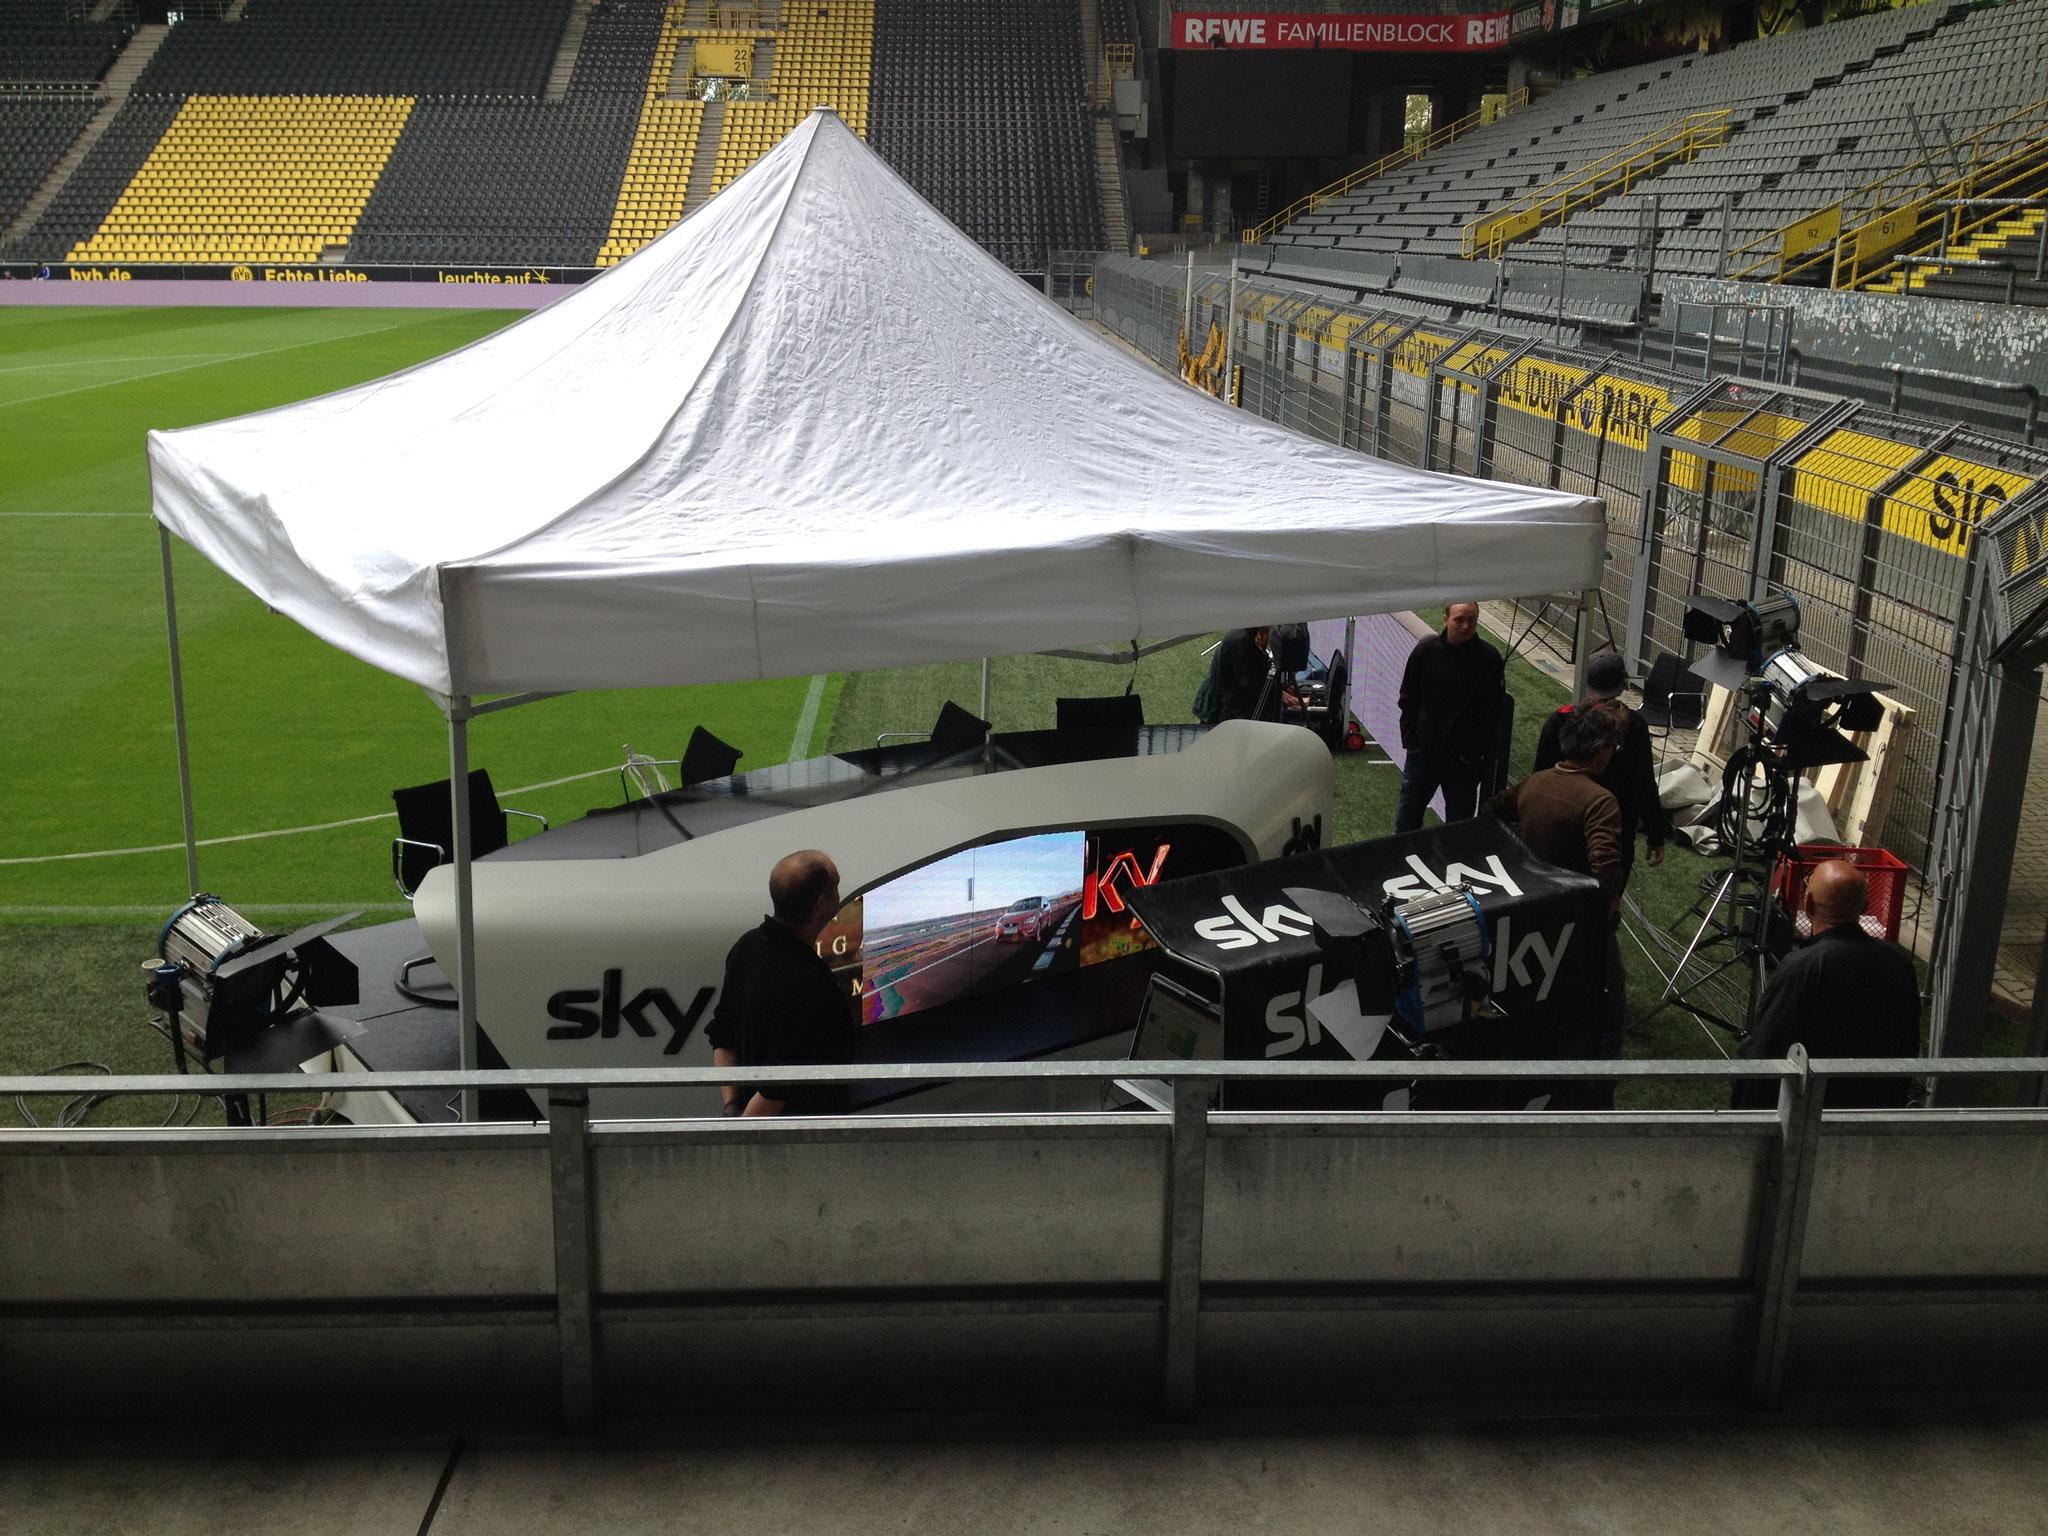 Iduna Park Stadion BVB Dortmund LED Screen Sky Topspiel Tisch